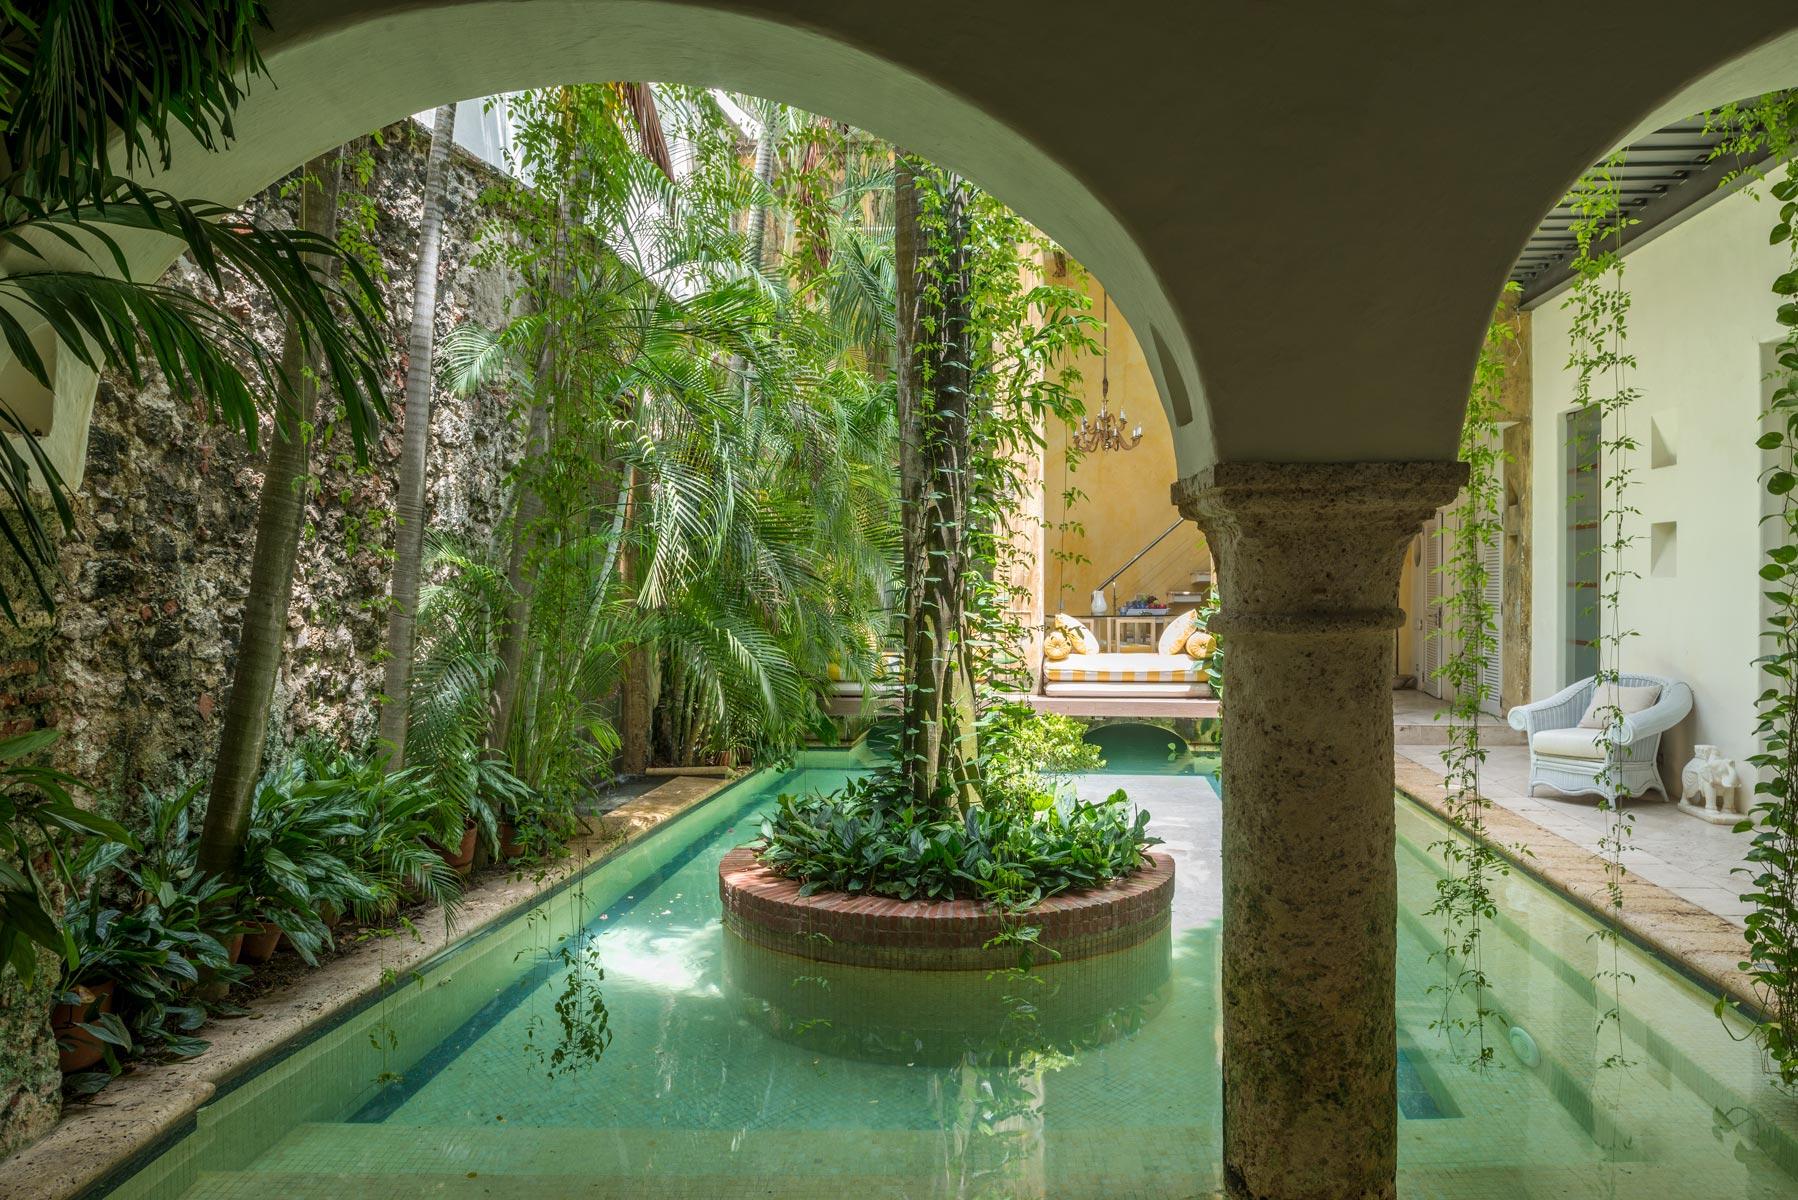 House, Cartagena, Colombia, Veronica Mishaan